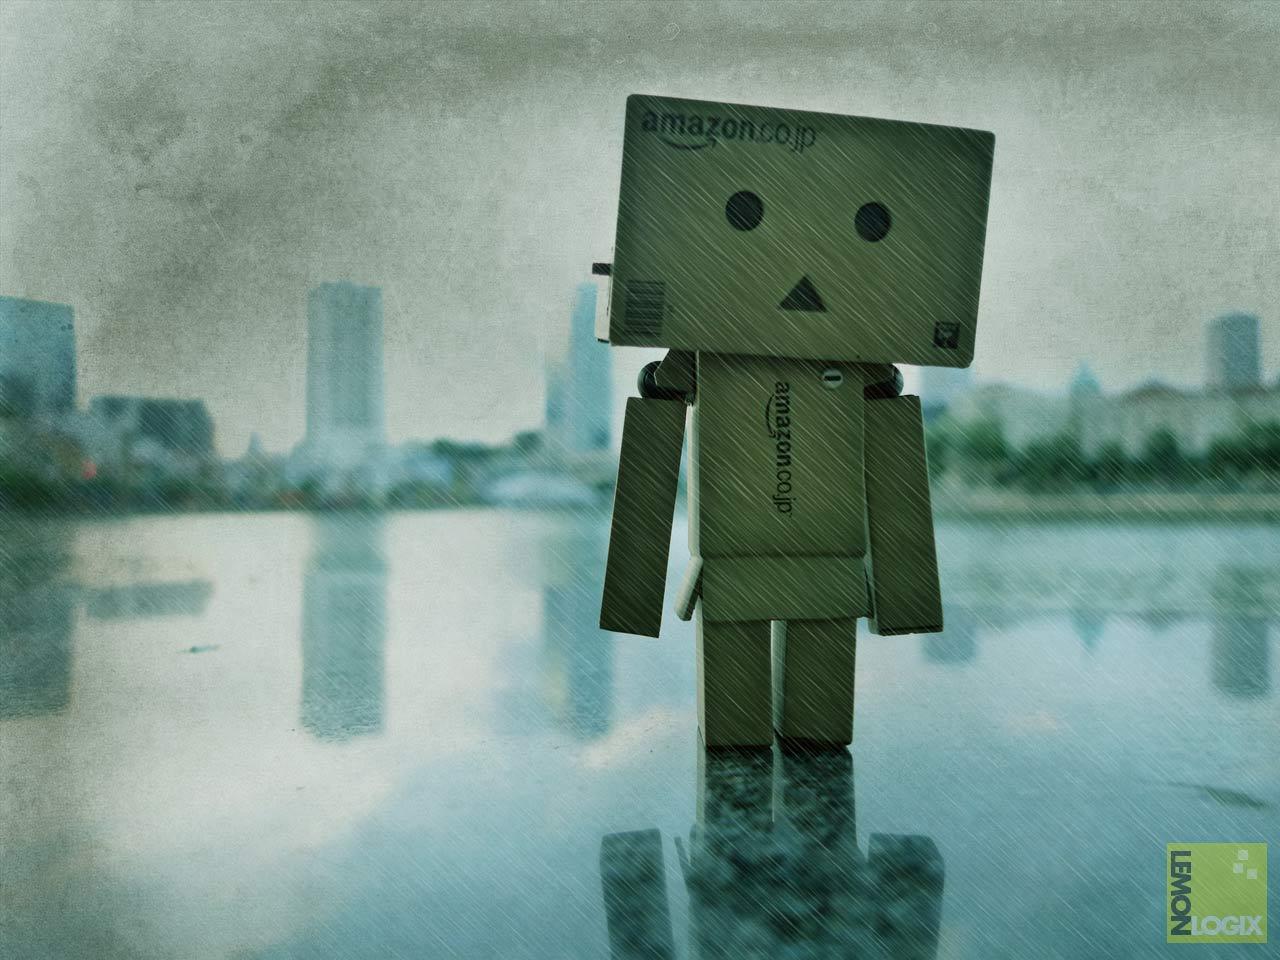 http://1.bp.blogspot.com/_Z8Y_Ns5DK0w/S_vsHQXSUVI/AAAAAAAACe0/KBOTpFb2BCE/s1600/urban-rain-wp.jpg